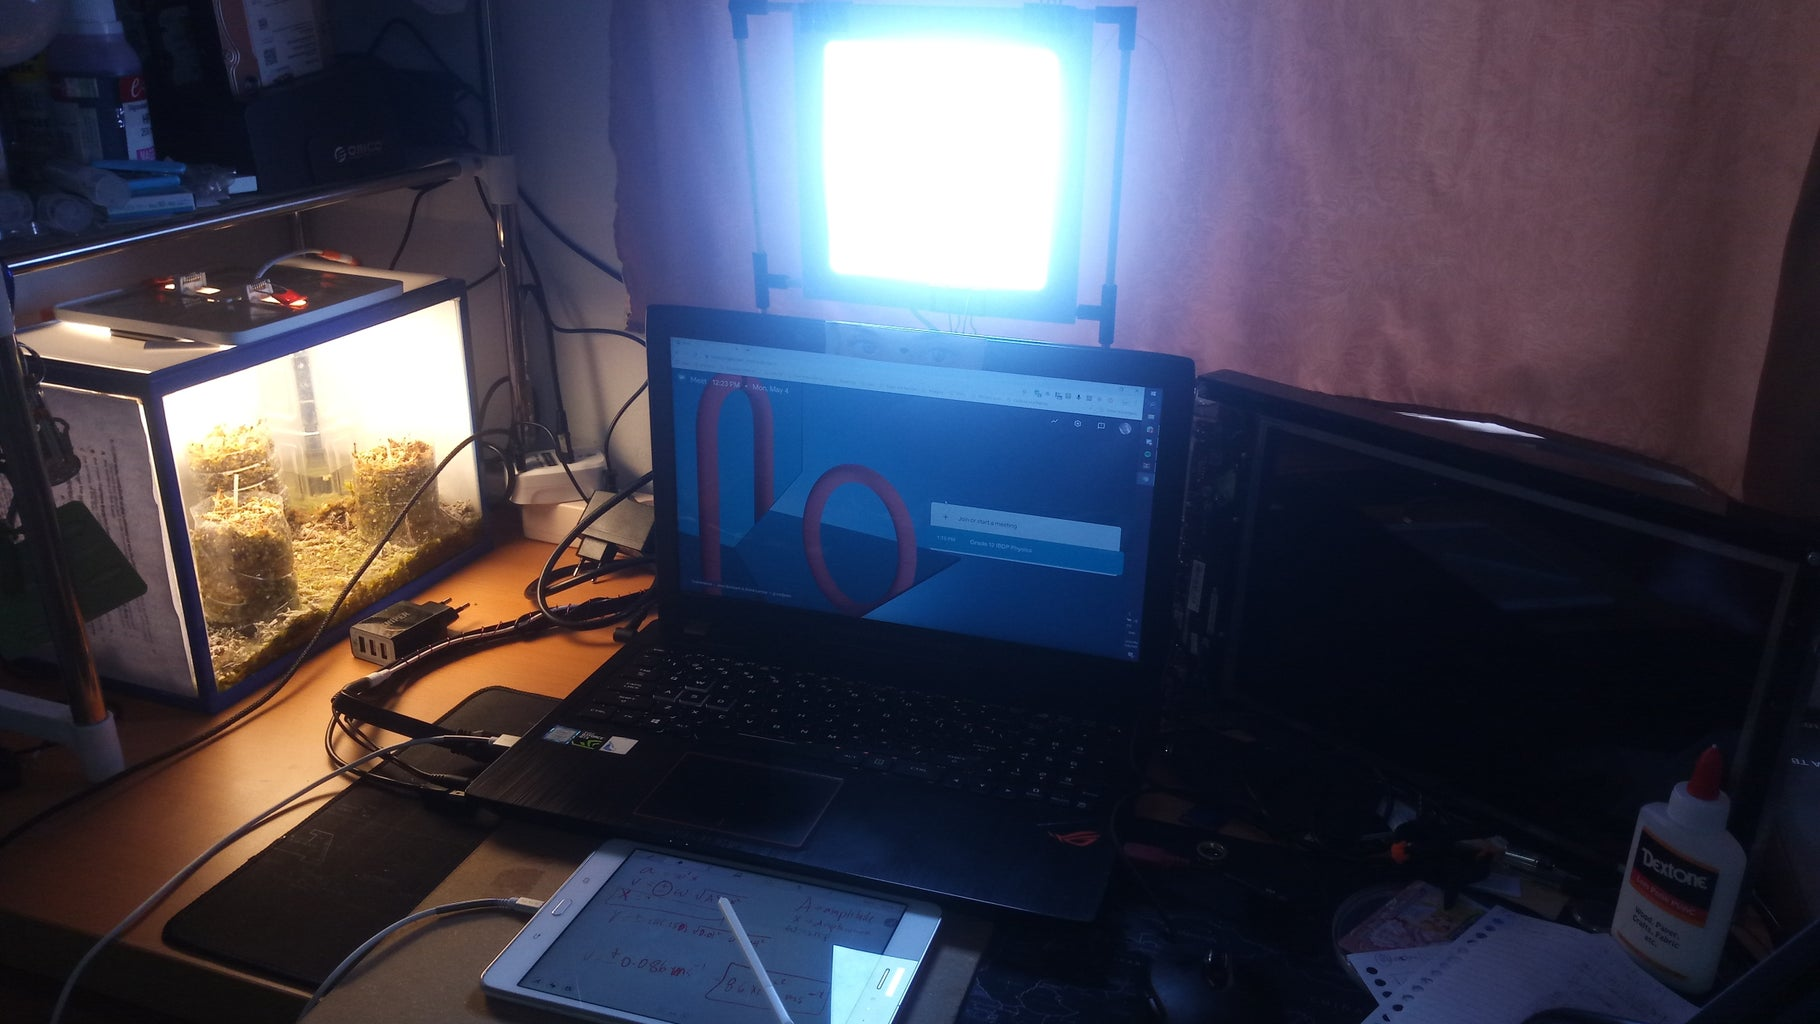 Virtual Classroom: Lights, Green Screen, and Virtual Board